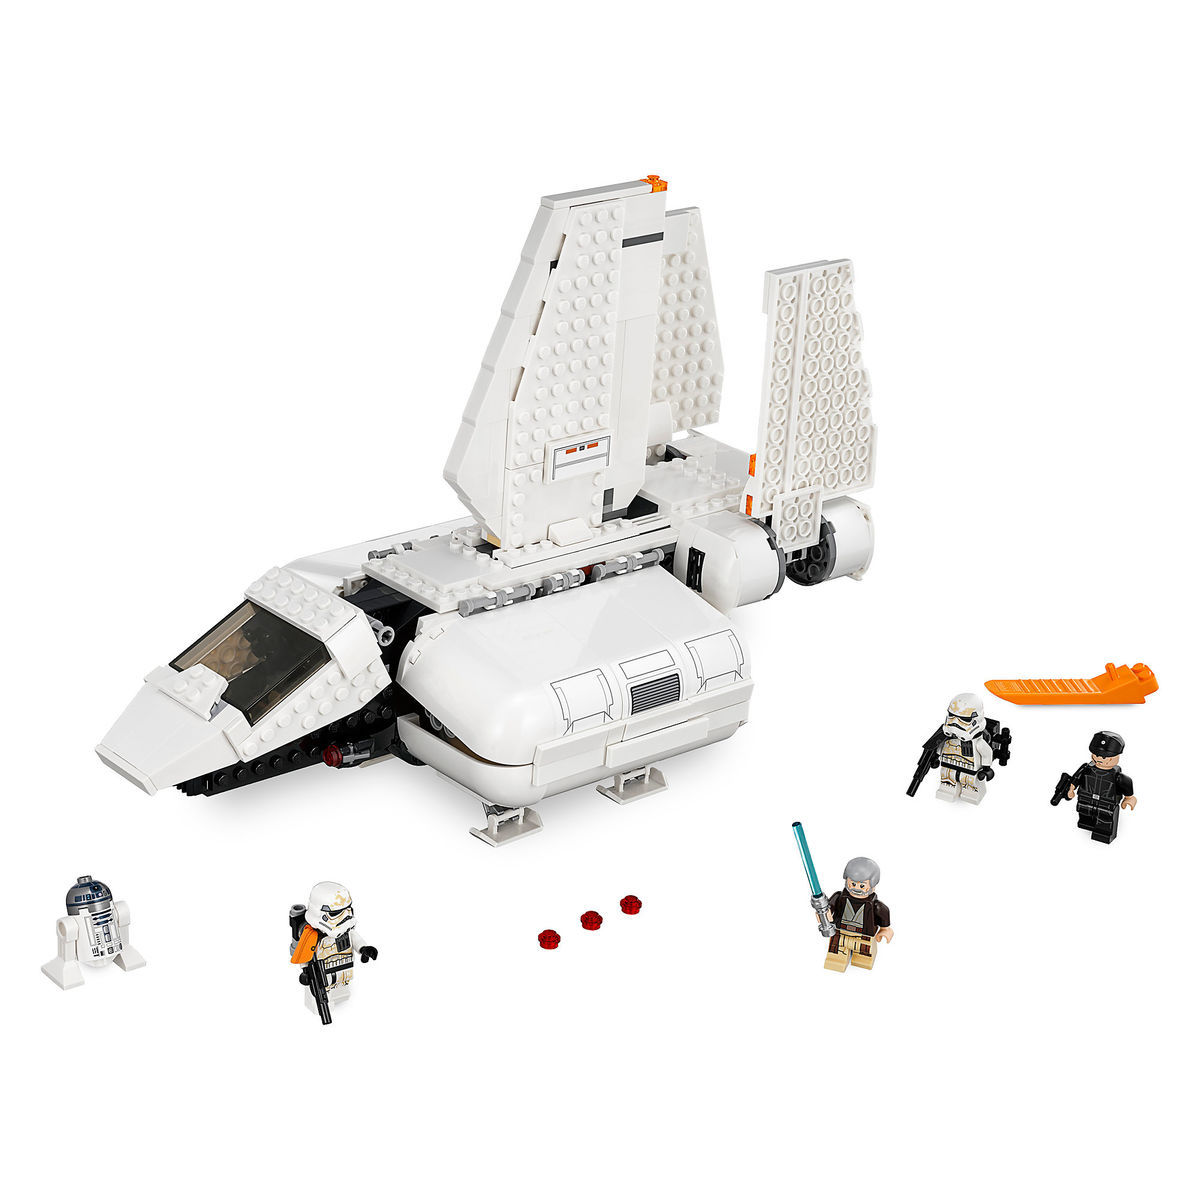 Imperial Landing Craft by LEGO - Star Wars   shopDisney